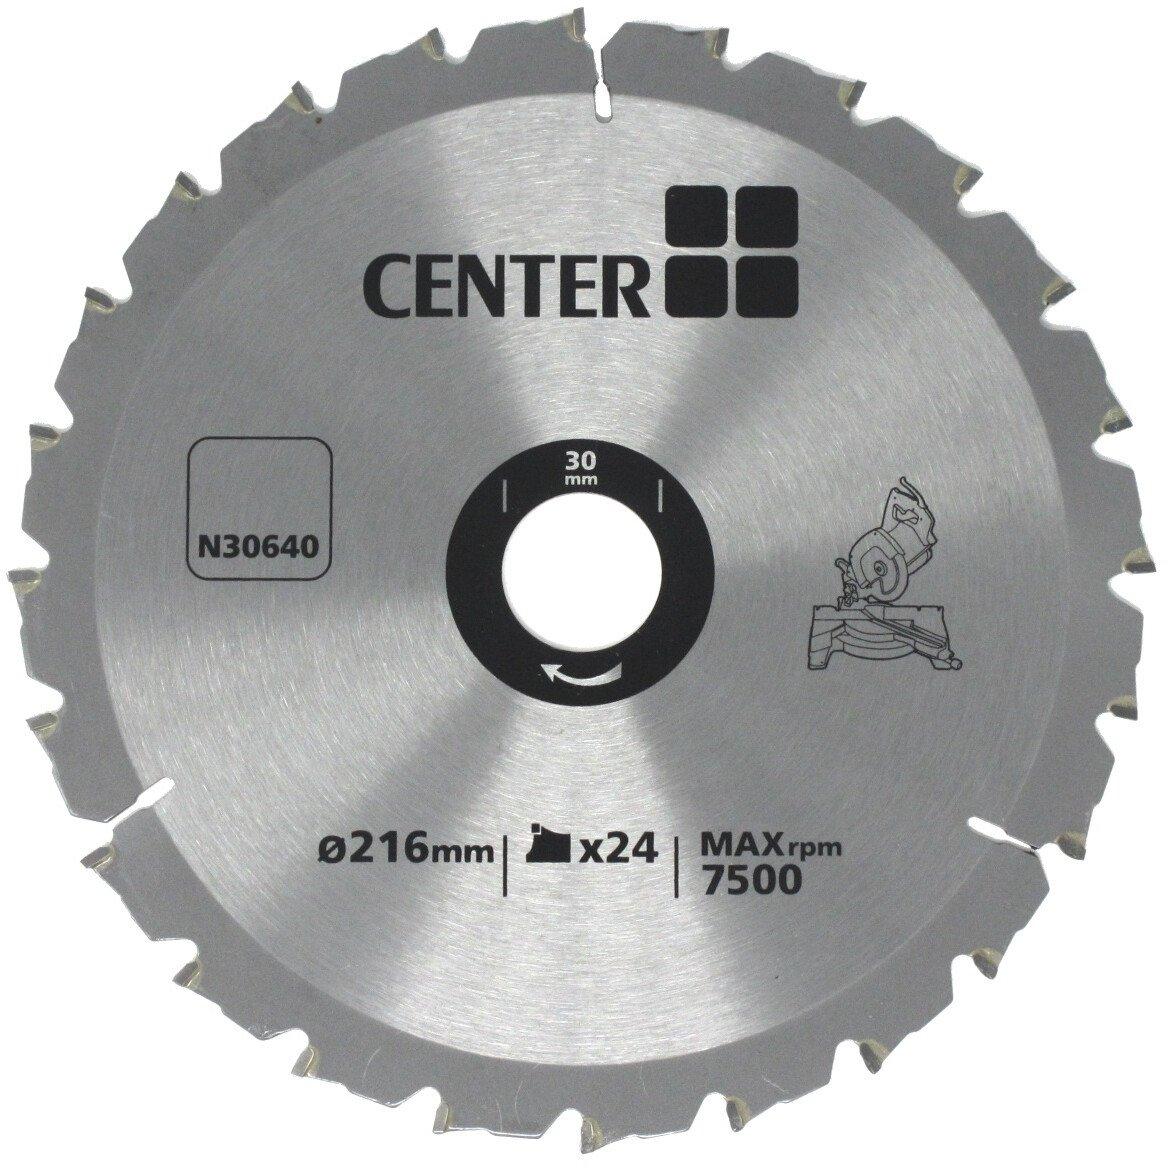 Lawson-HIS N30640 TCT Circular Saw Blade 216mm x 30mm x 24T